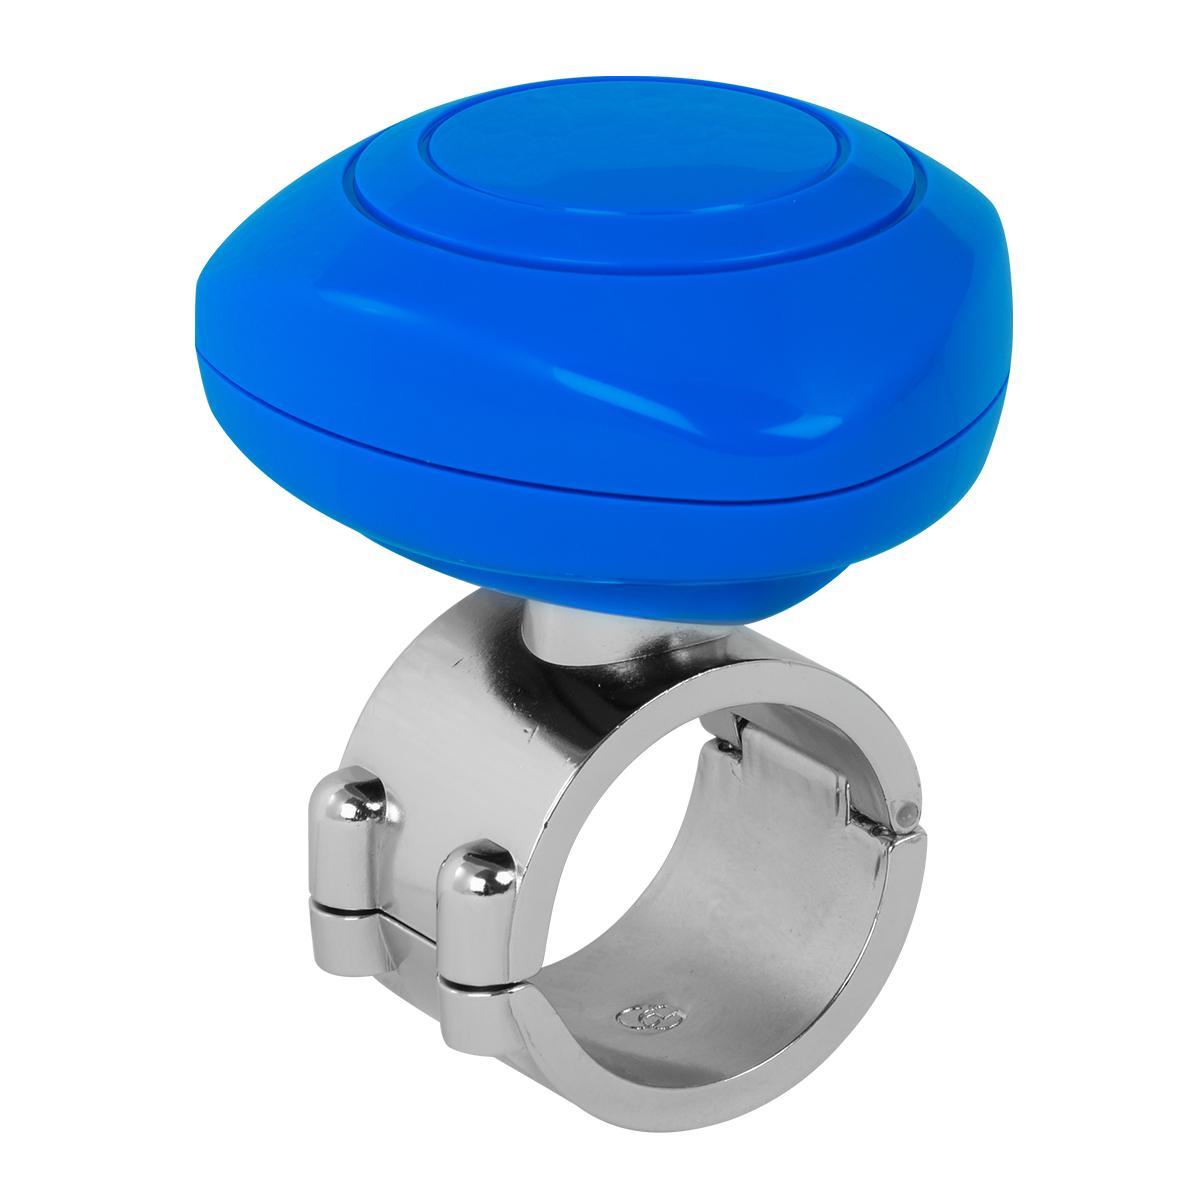 80105 Blue Plastic Steering Wheel Spinner